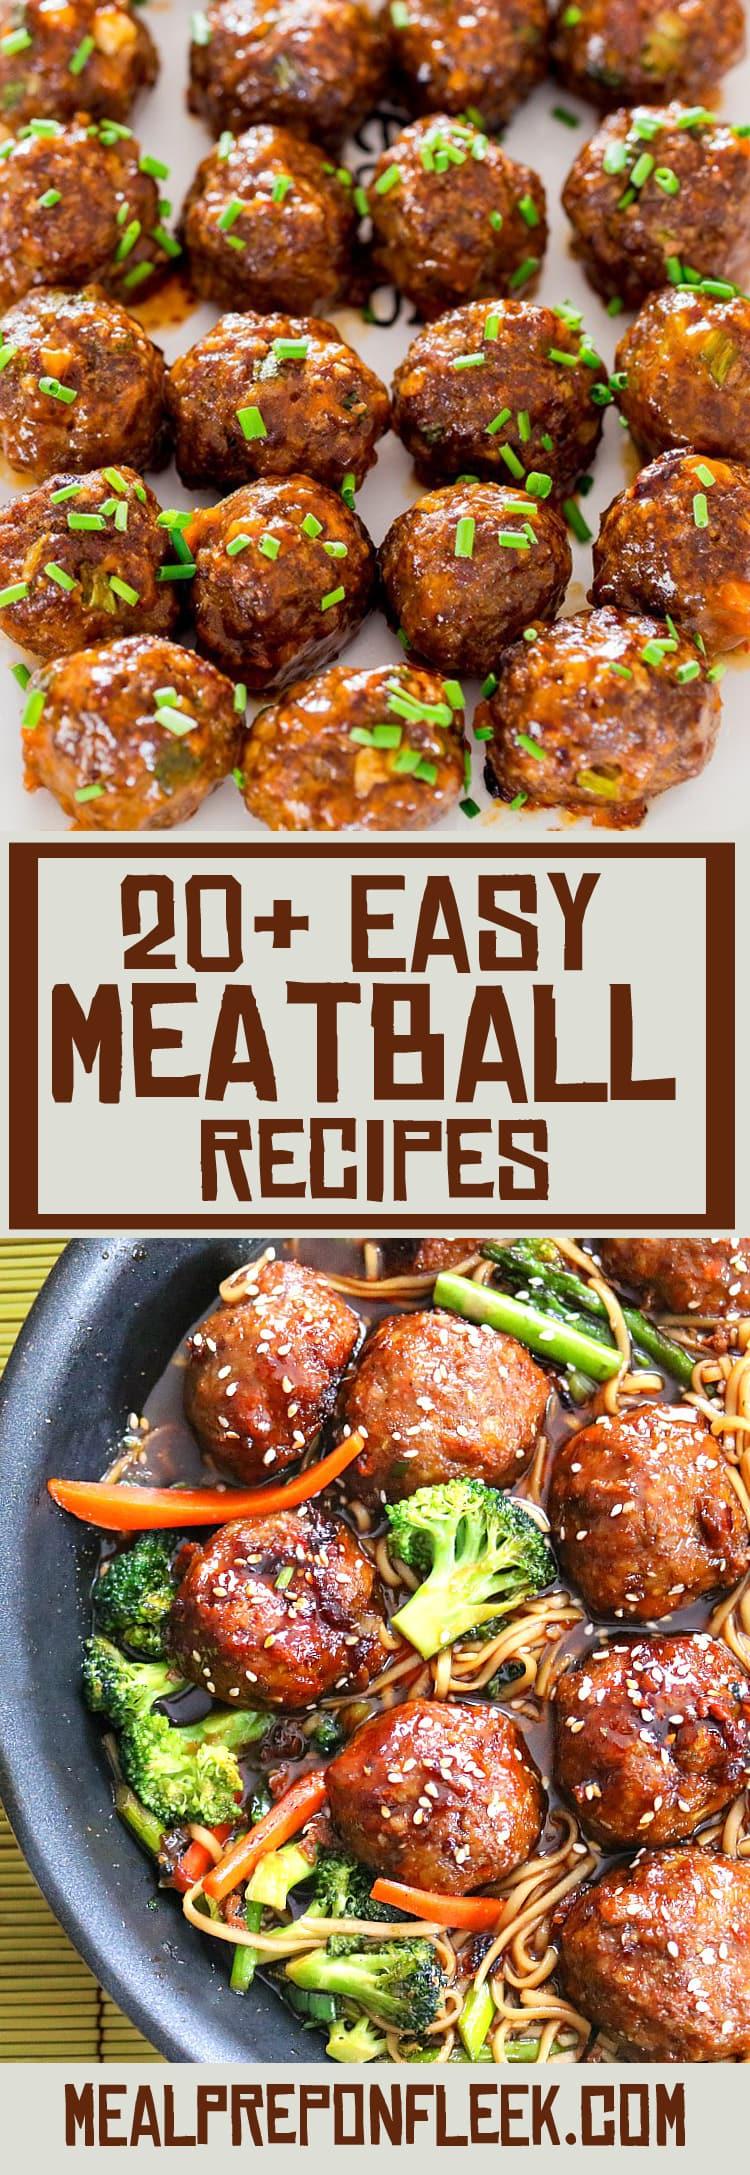 20 Easy Meal Prep Recipes